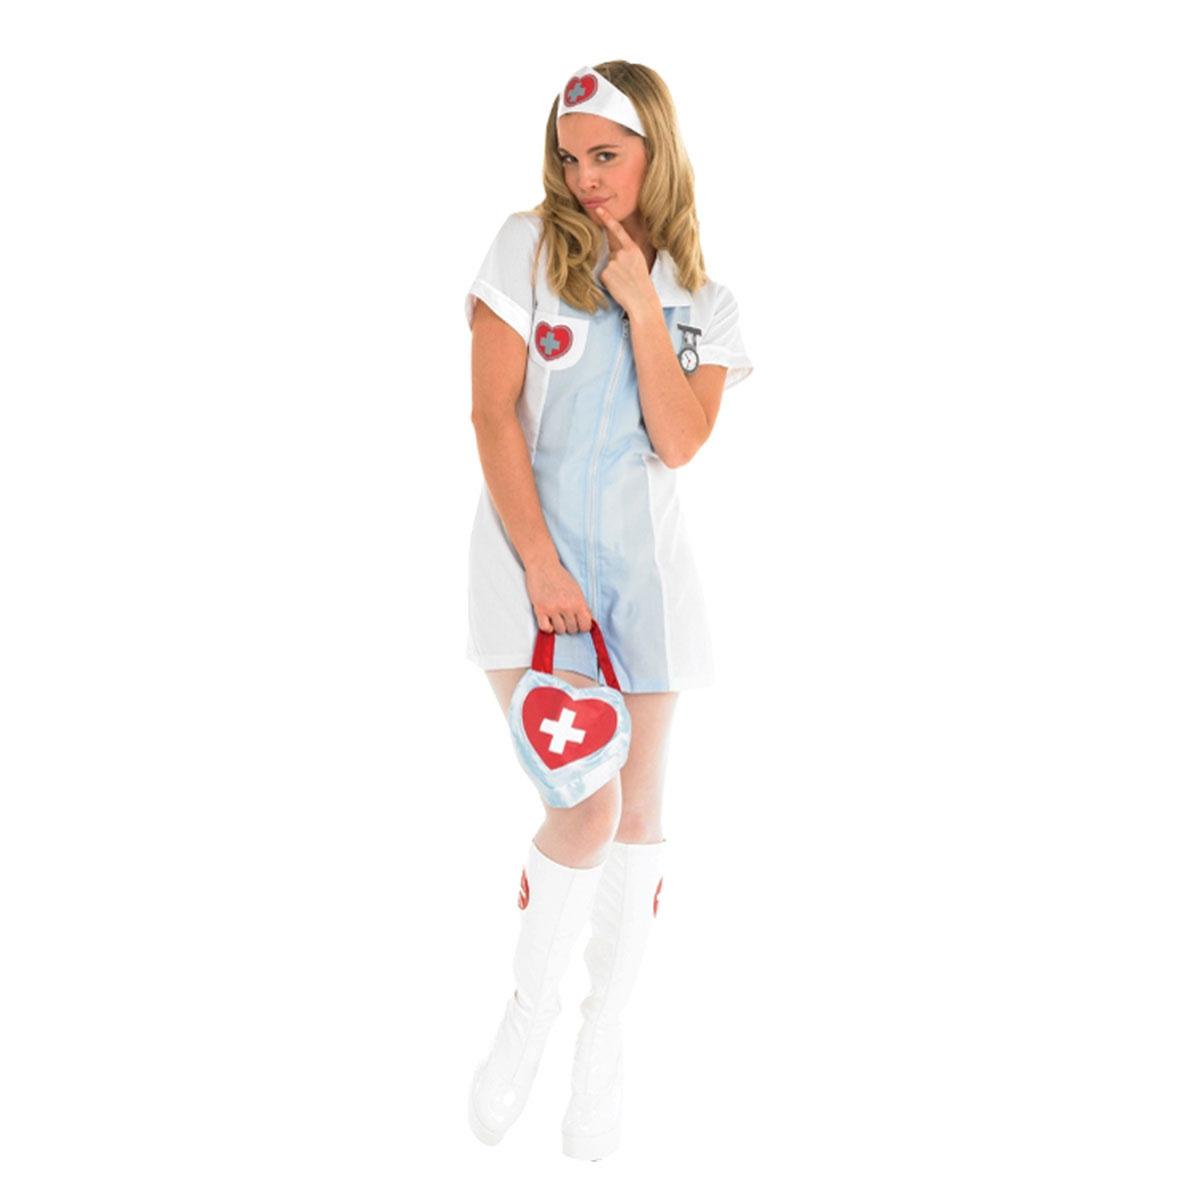 official adult nurse fancy dress costume  light blue